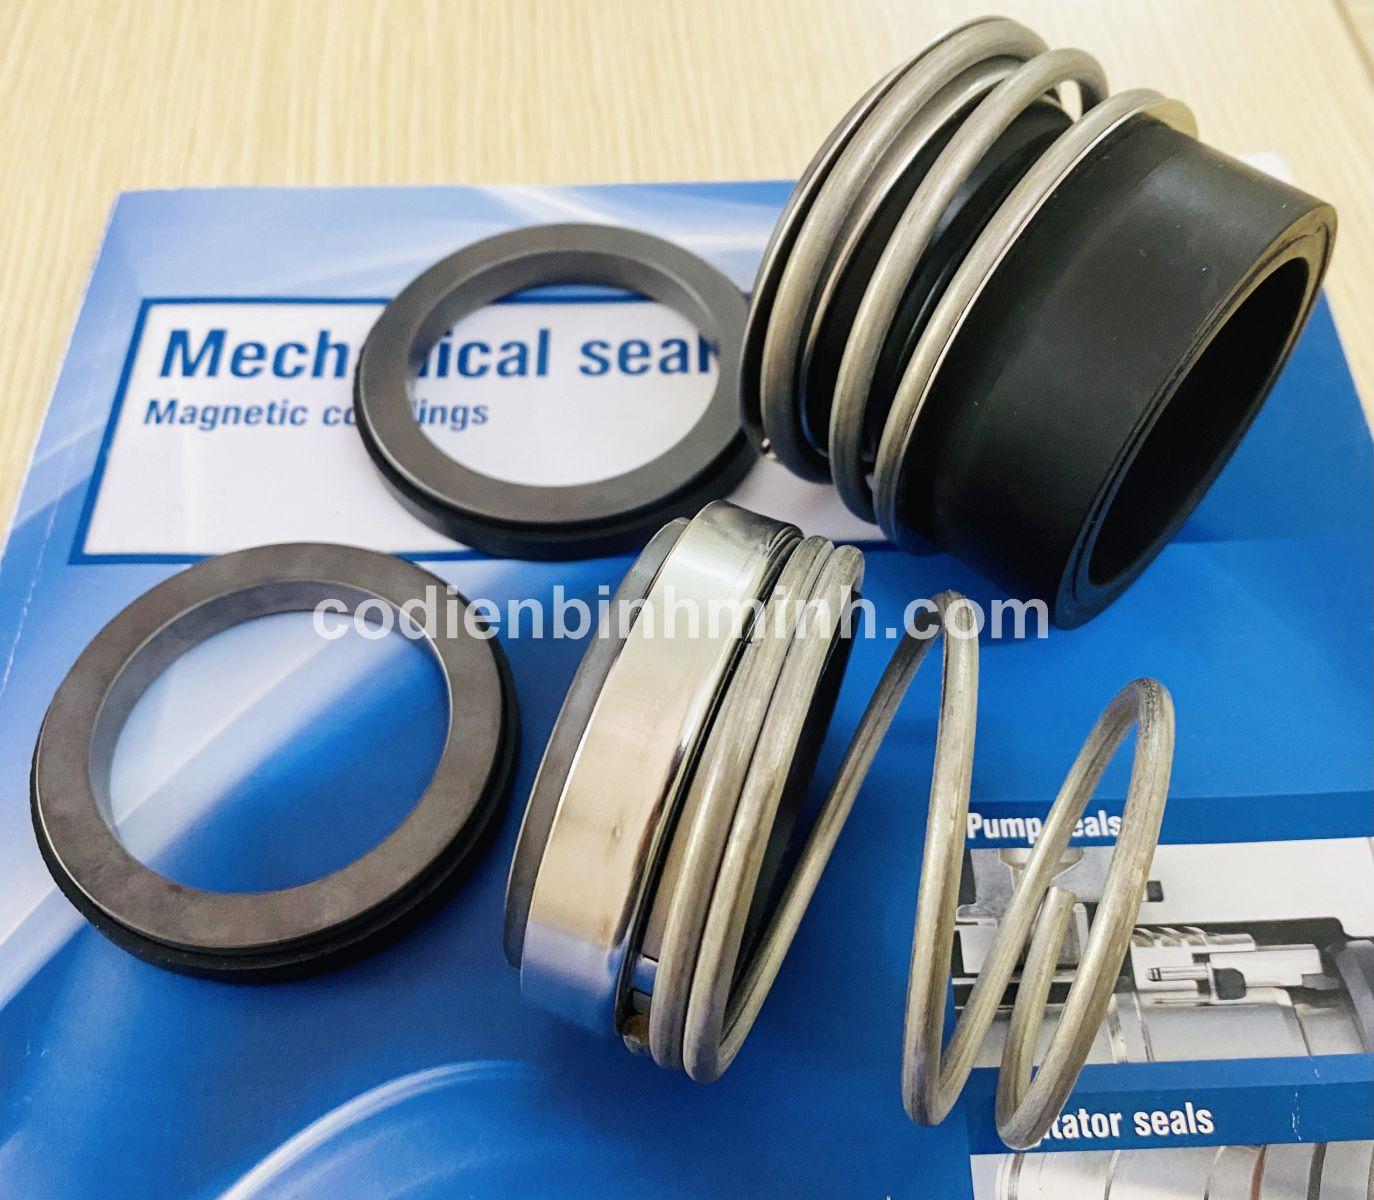 Phốt cơ khí Eagle Burgmann Mechanical Seals